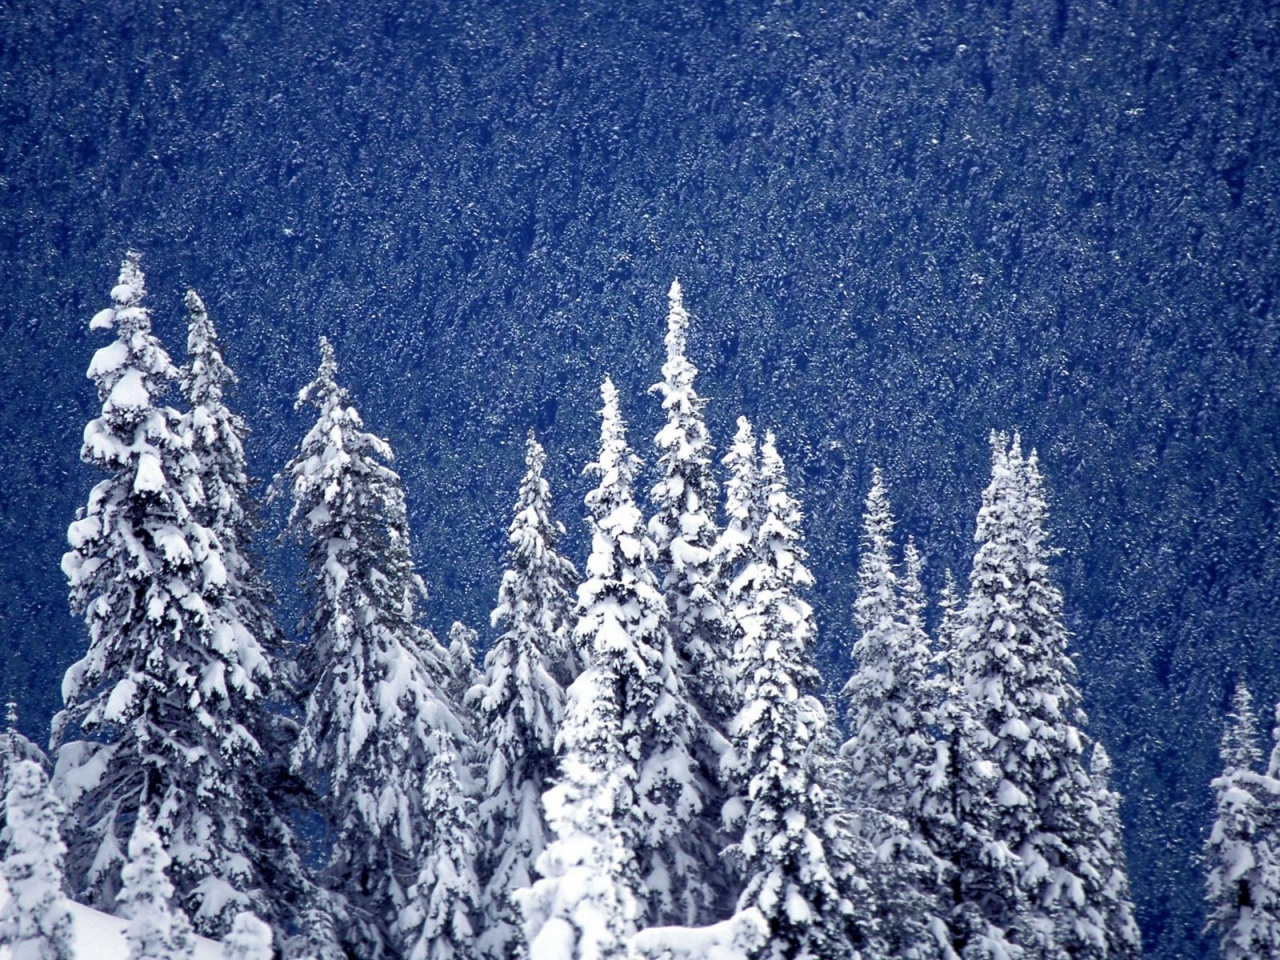 Free Animated Desktop Wallpaper Like Snow Falling On Background Hero Raindrops Falling